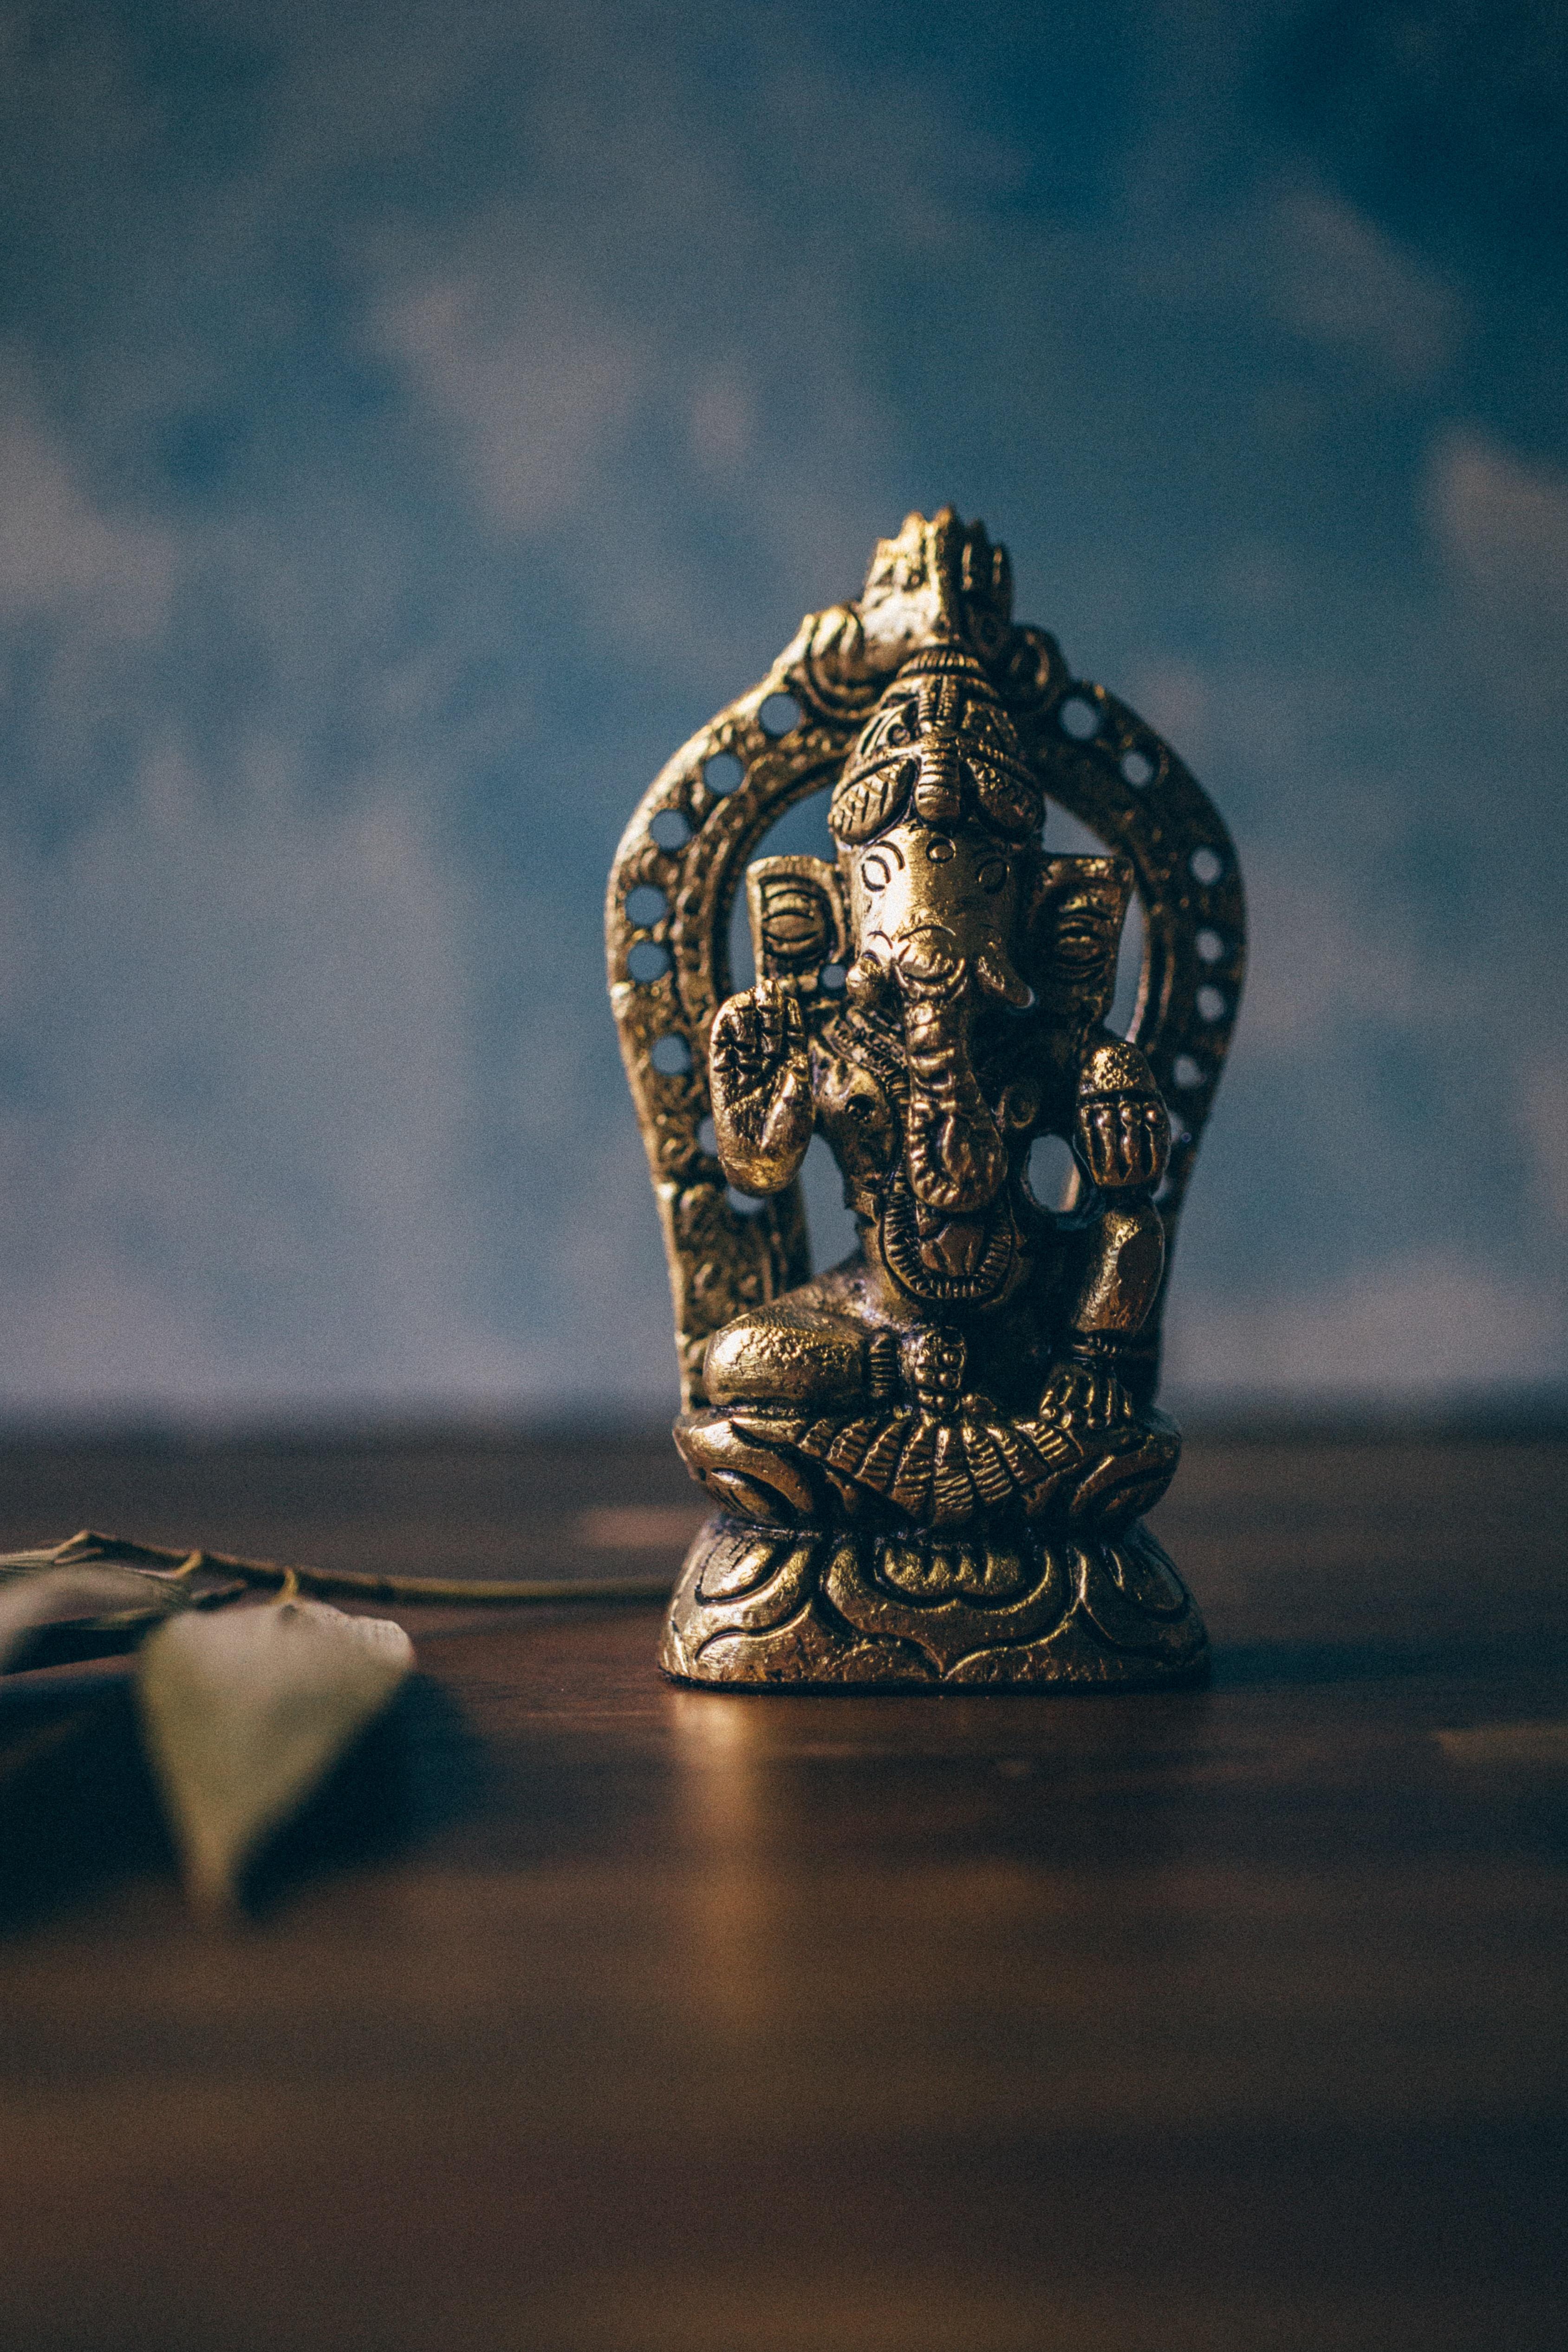 Ganesha figurine on brown surface